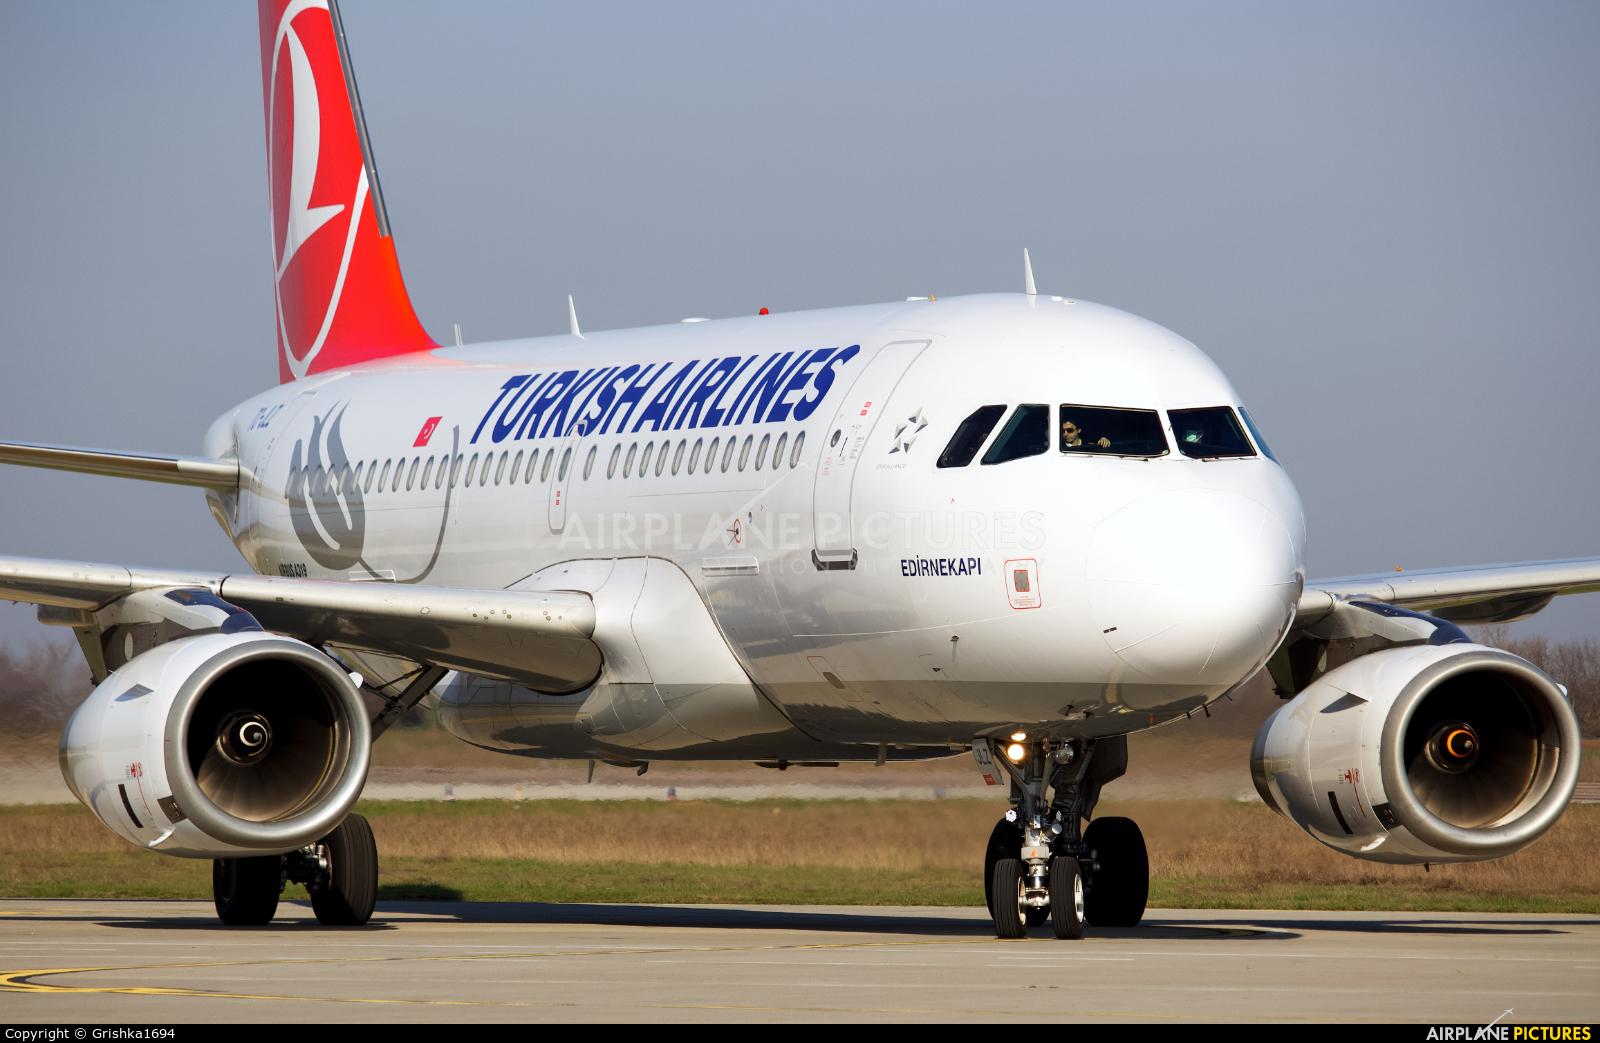 Turkish Airlines TC-JLZ aircraft at Kherson International